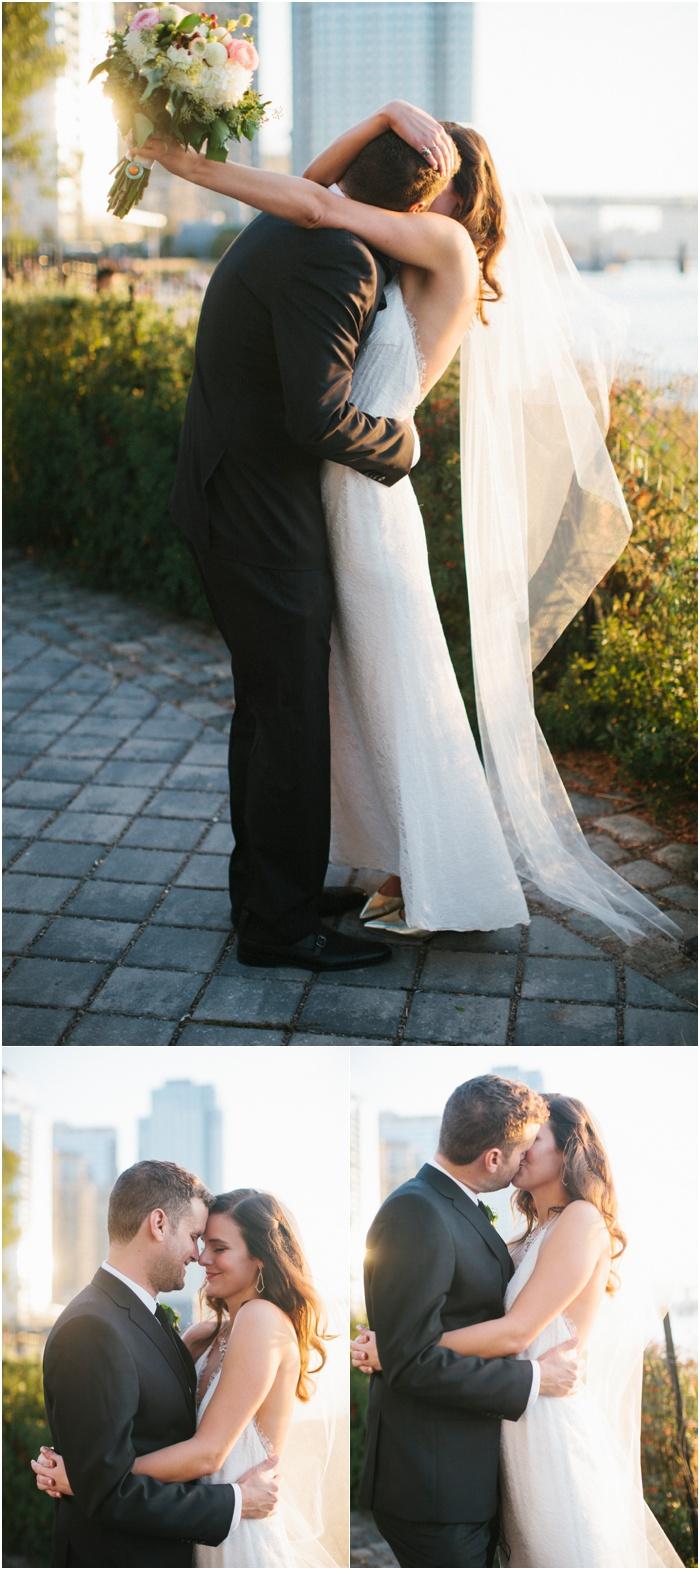 17_new york wedding photographer.jpeg